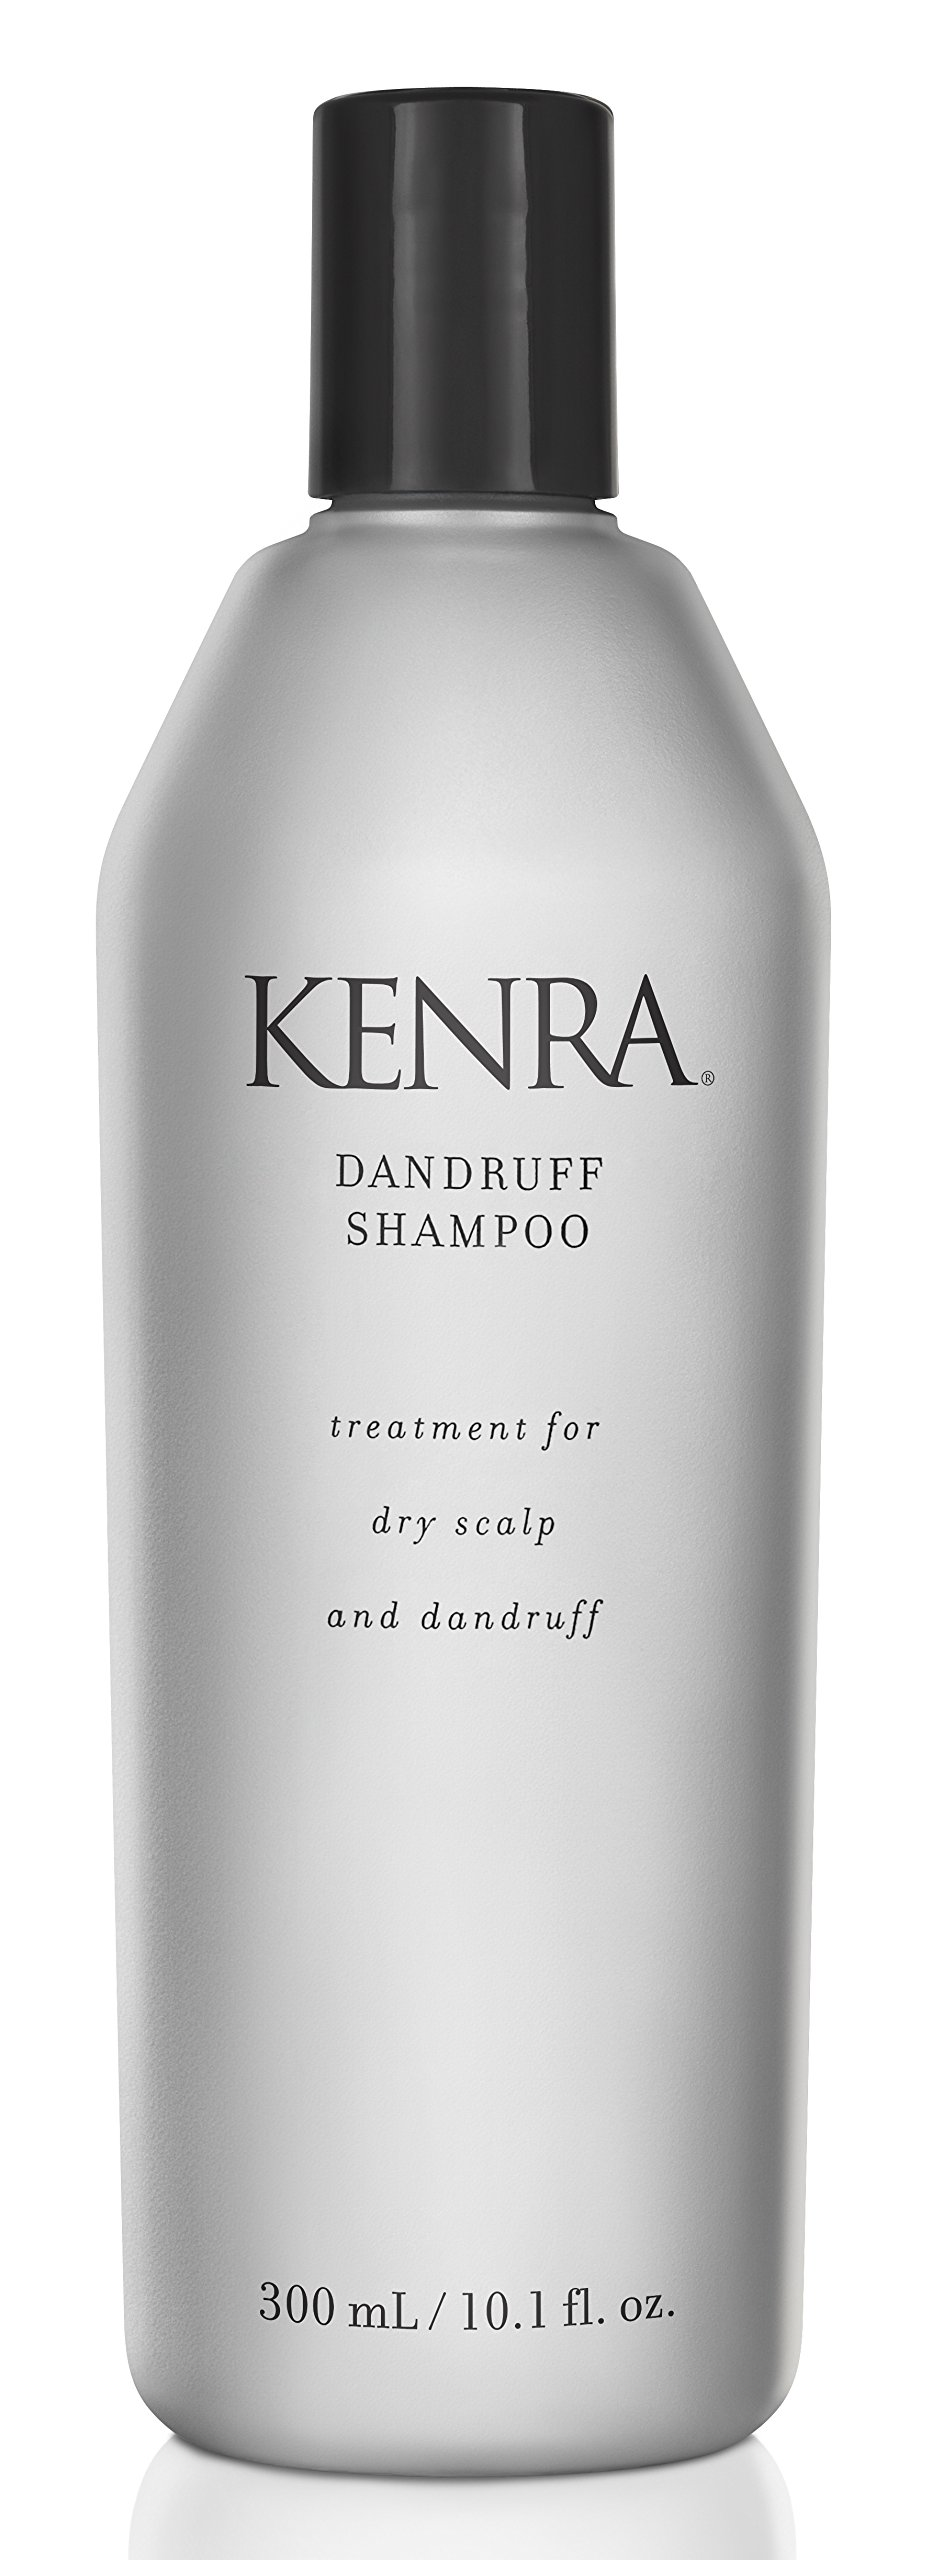 Kenra Dandruff Shampoo, 10.1-Ounce